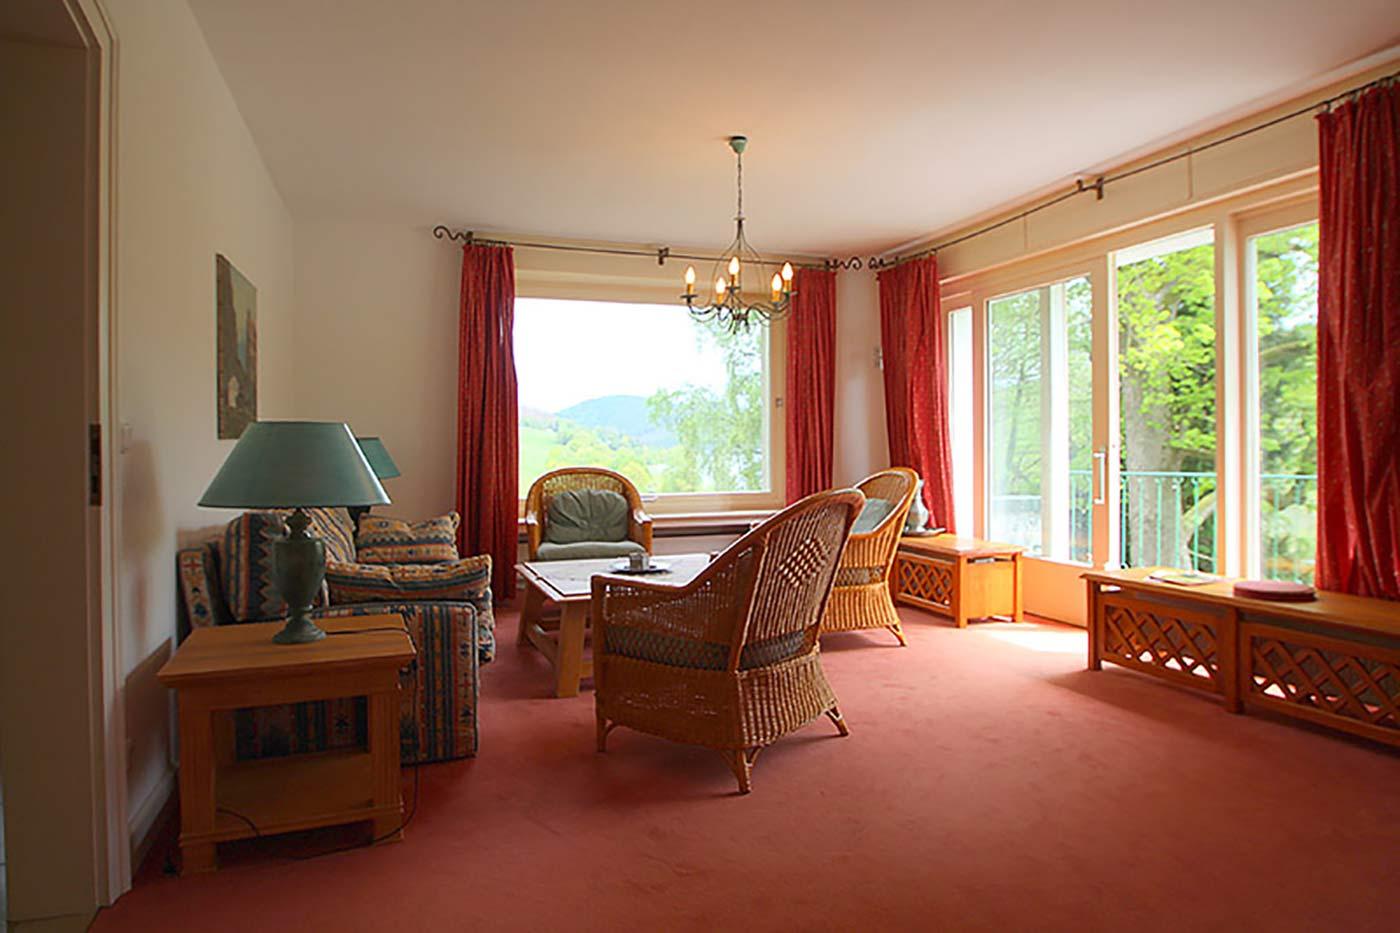 Vorher-Foto vom Wohnzimmer | Blickfang Homestaging in Soest